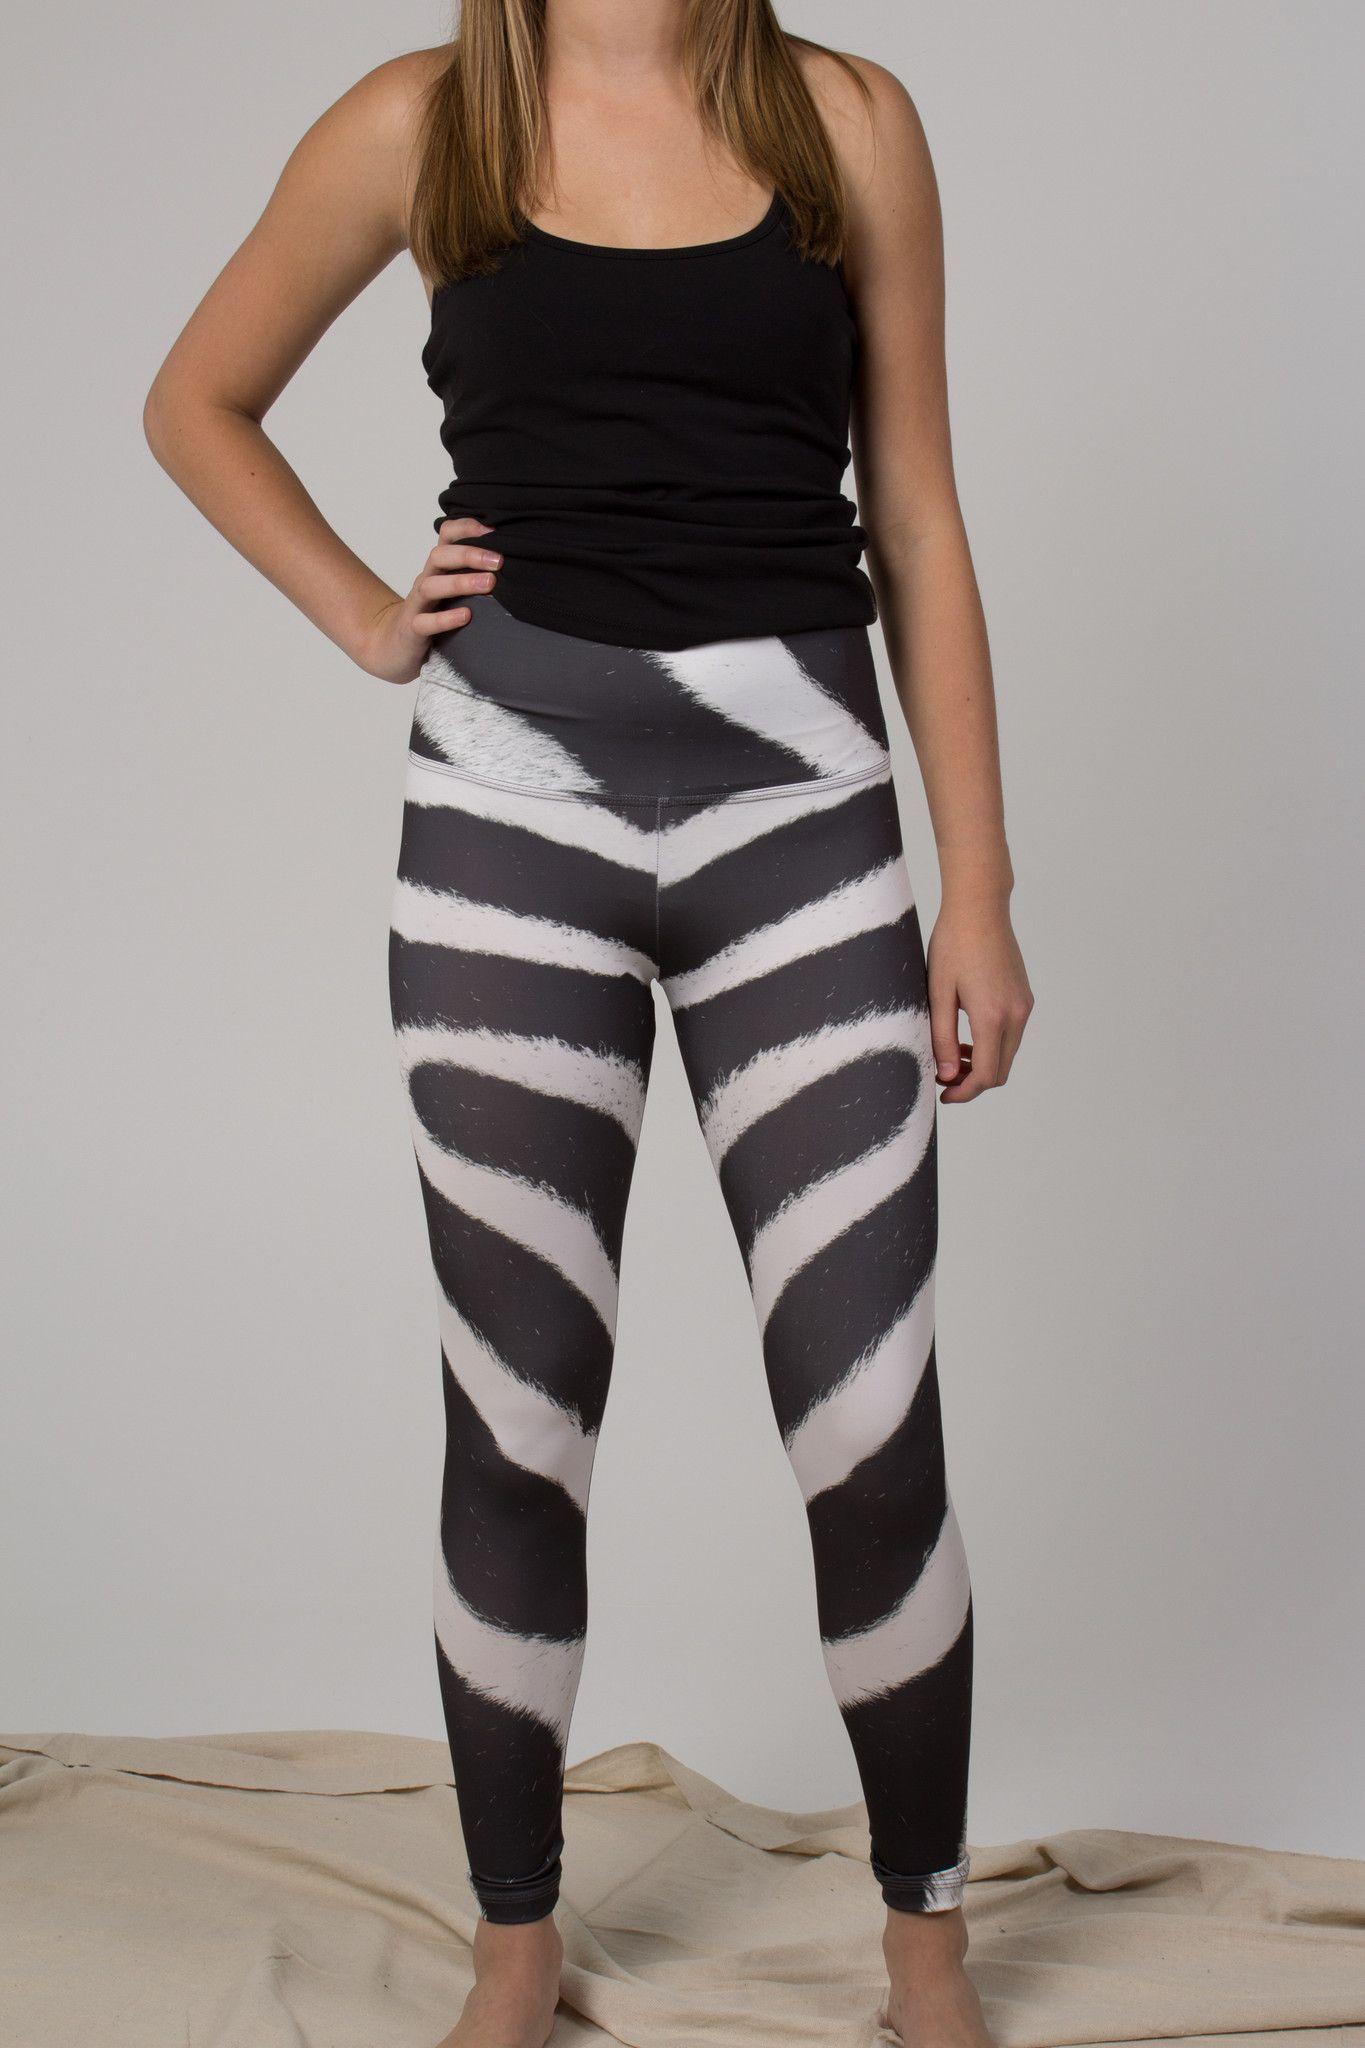 fdebaecbb4f11 Om Shanti Clothing Zebra Legging   Outfits   Zebra leggings, Om ...